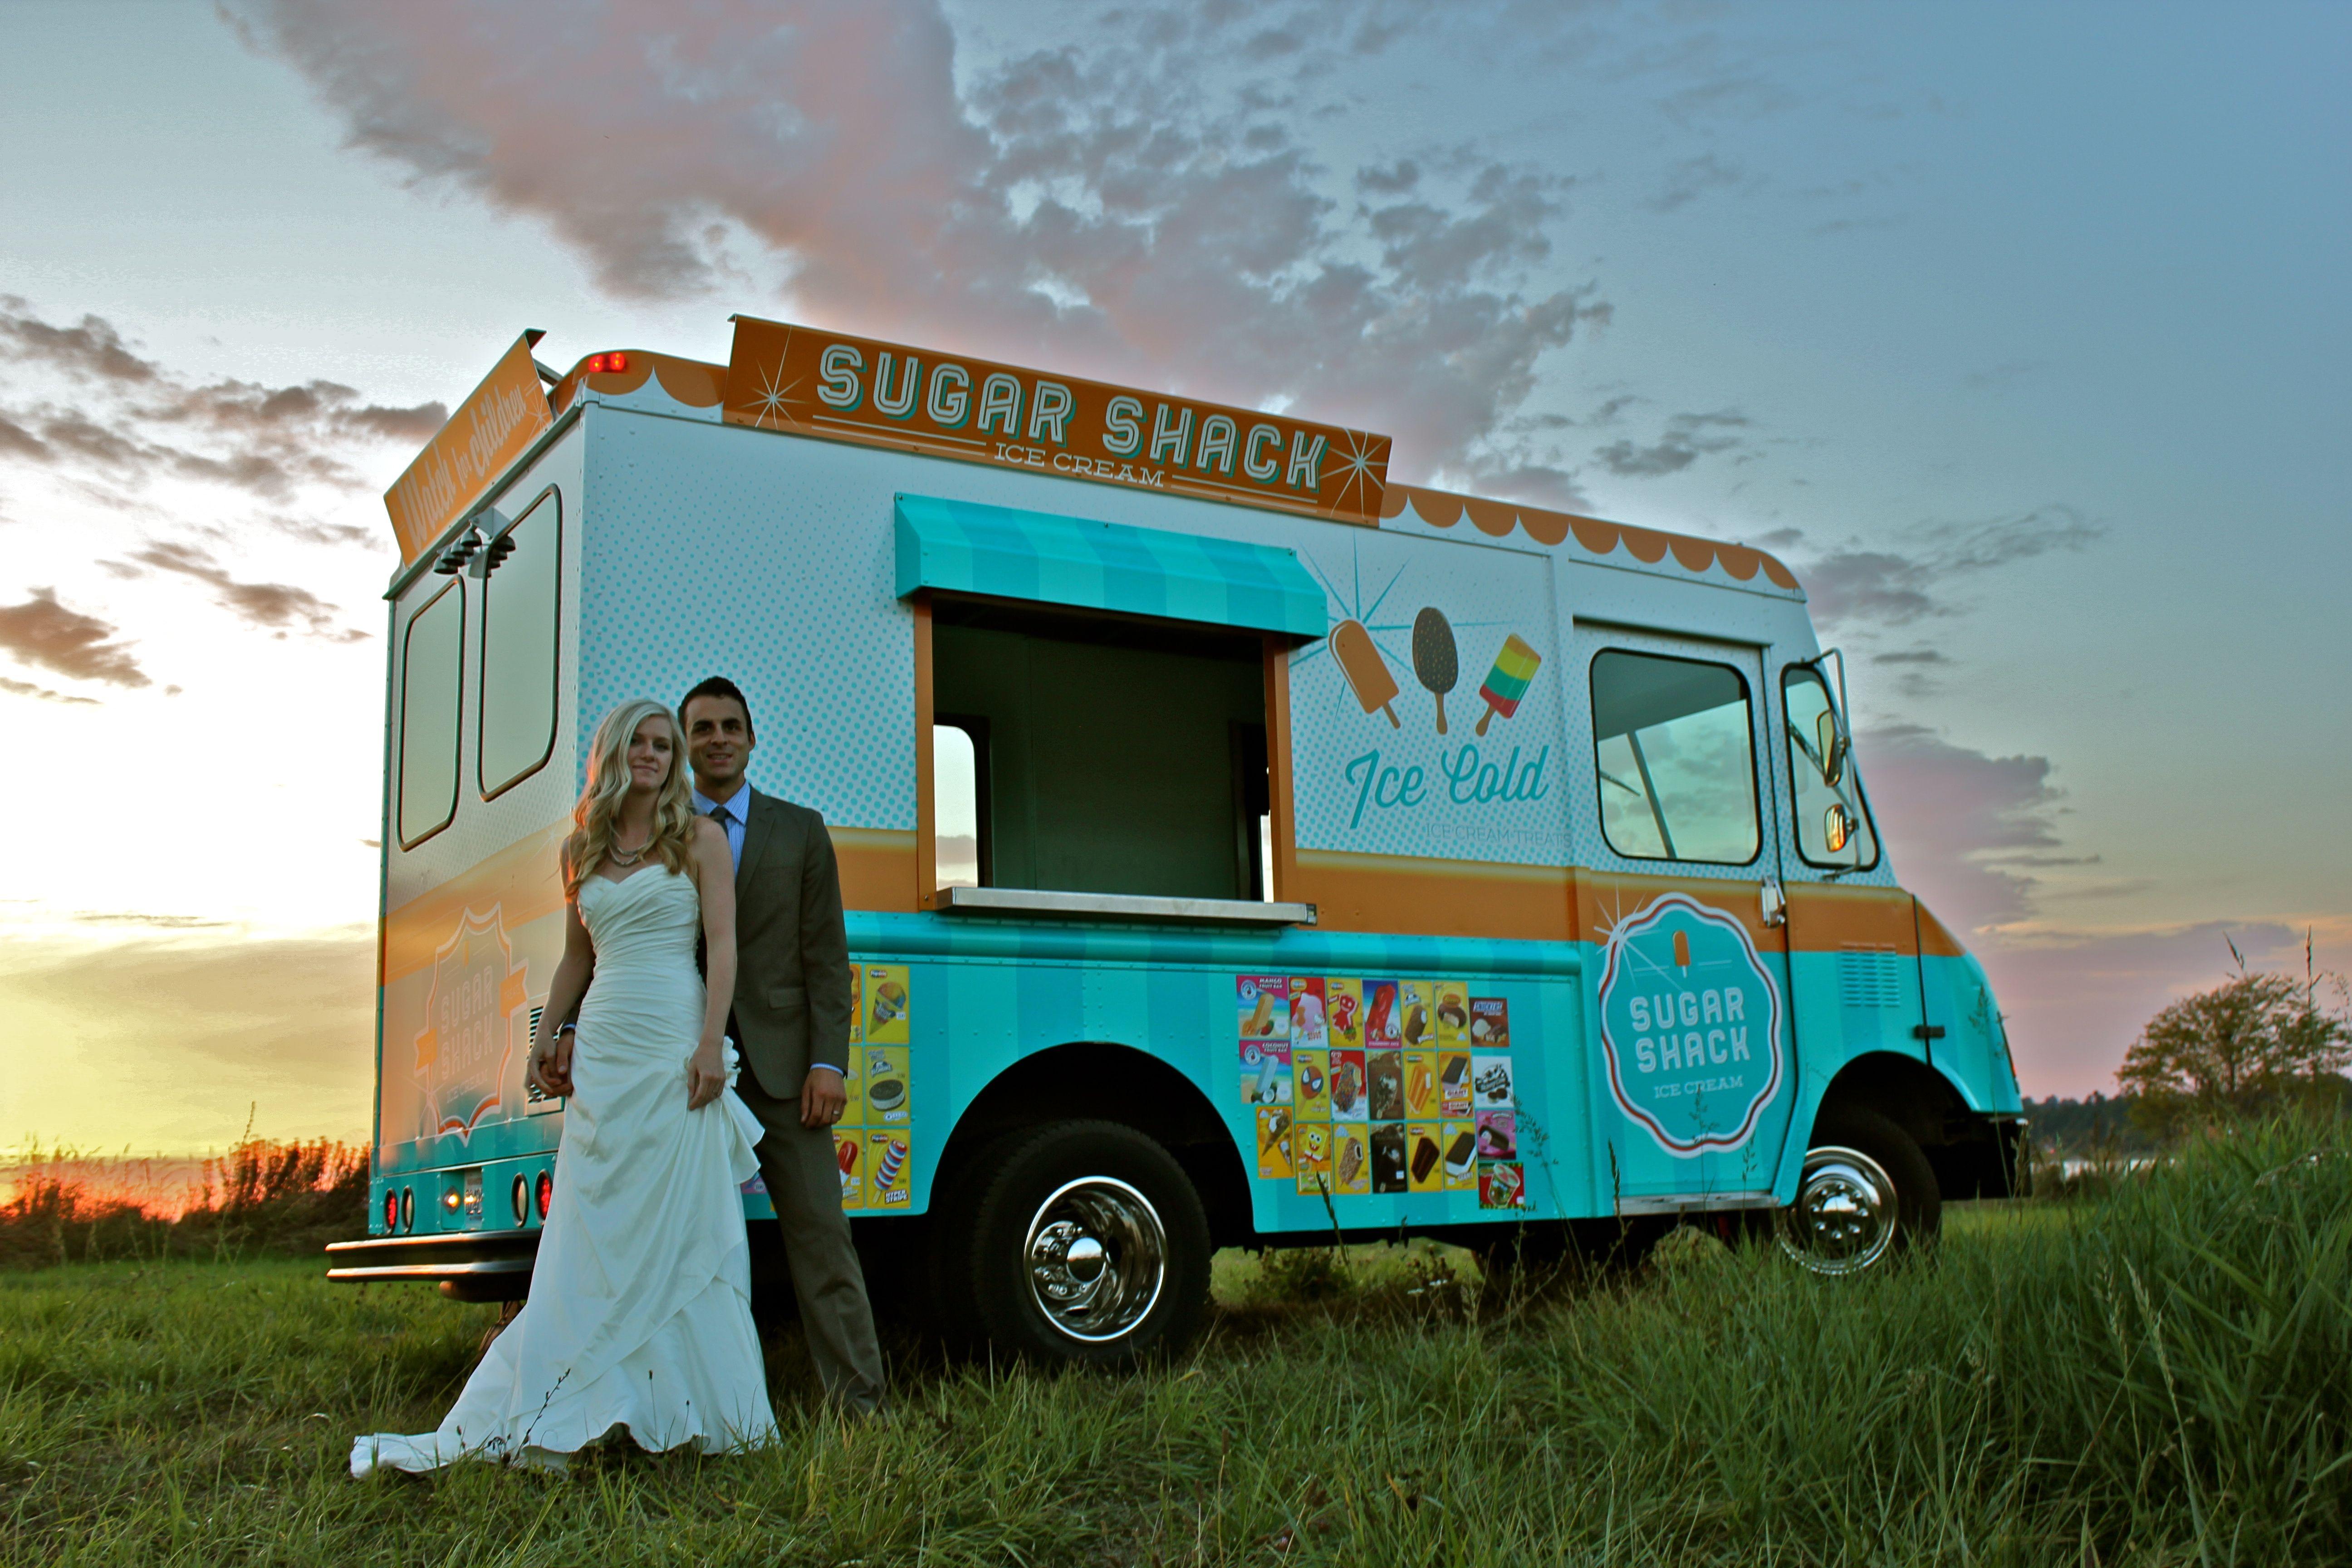 Ice cream truck food truck at wedding couple photos ice